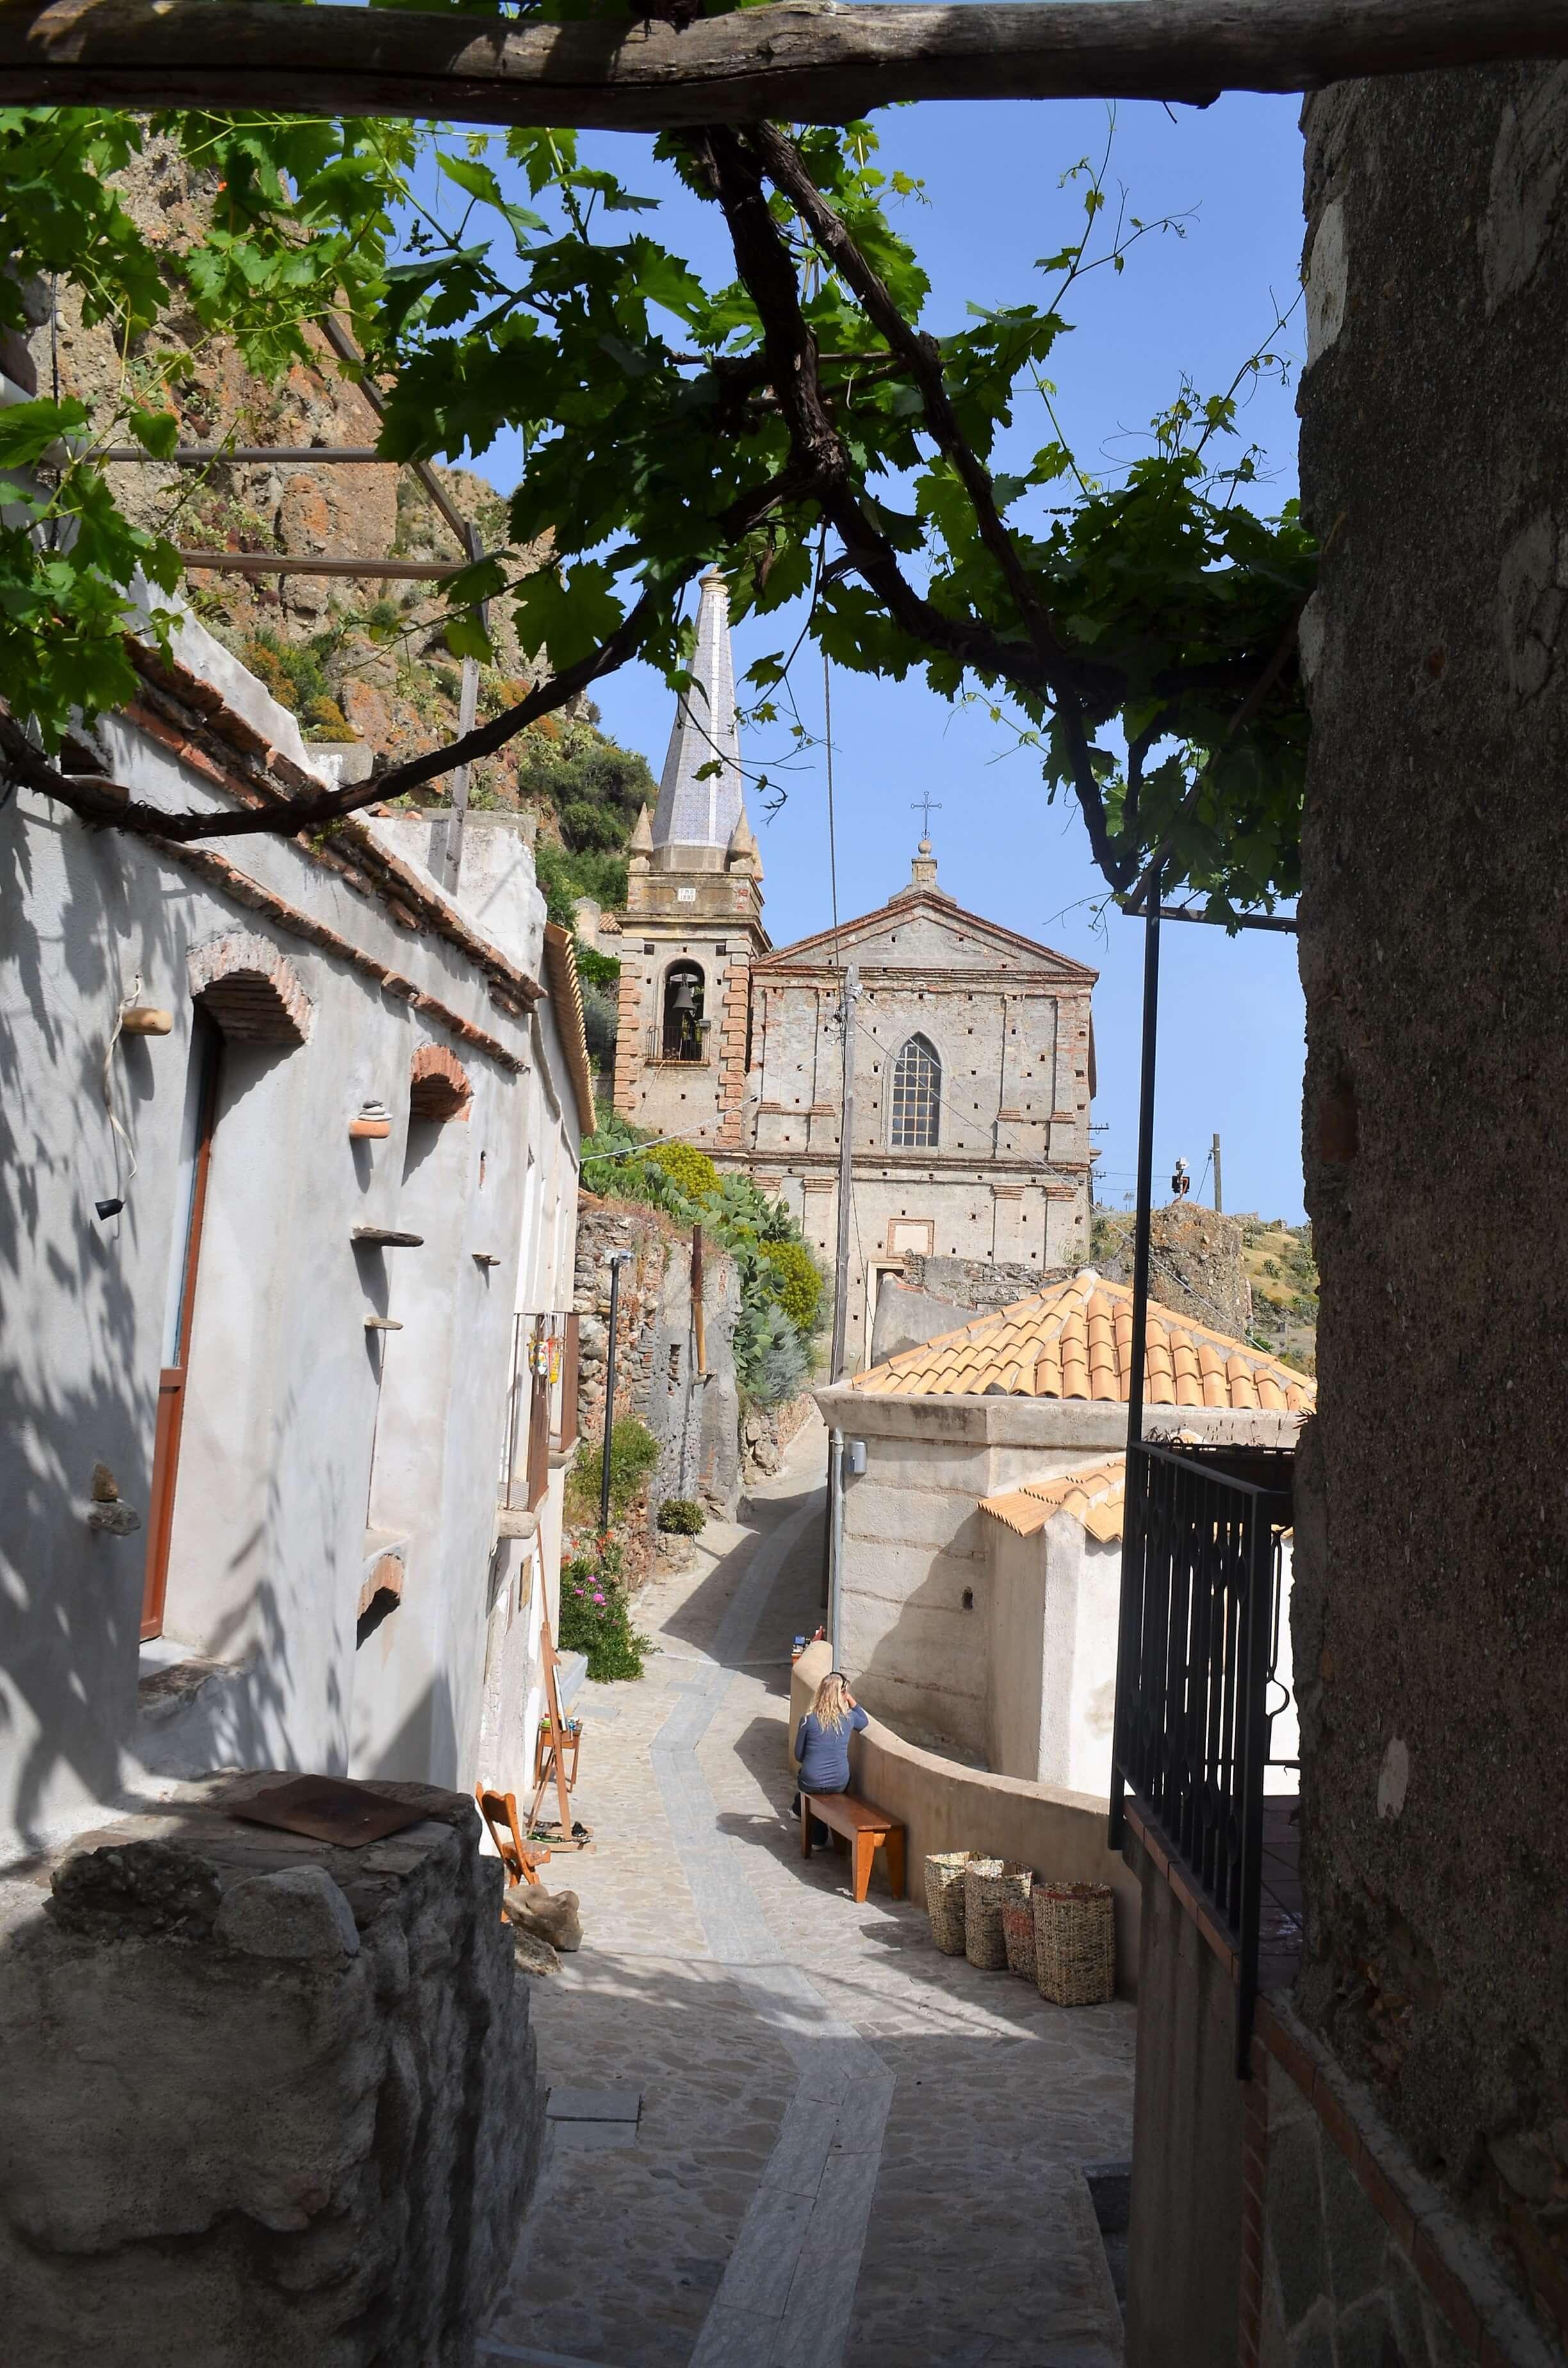 pentedattilo church ss peter and paul.jpg